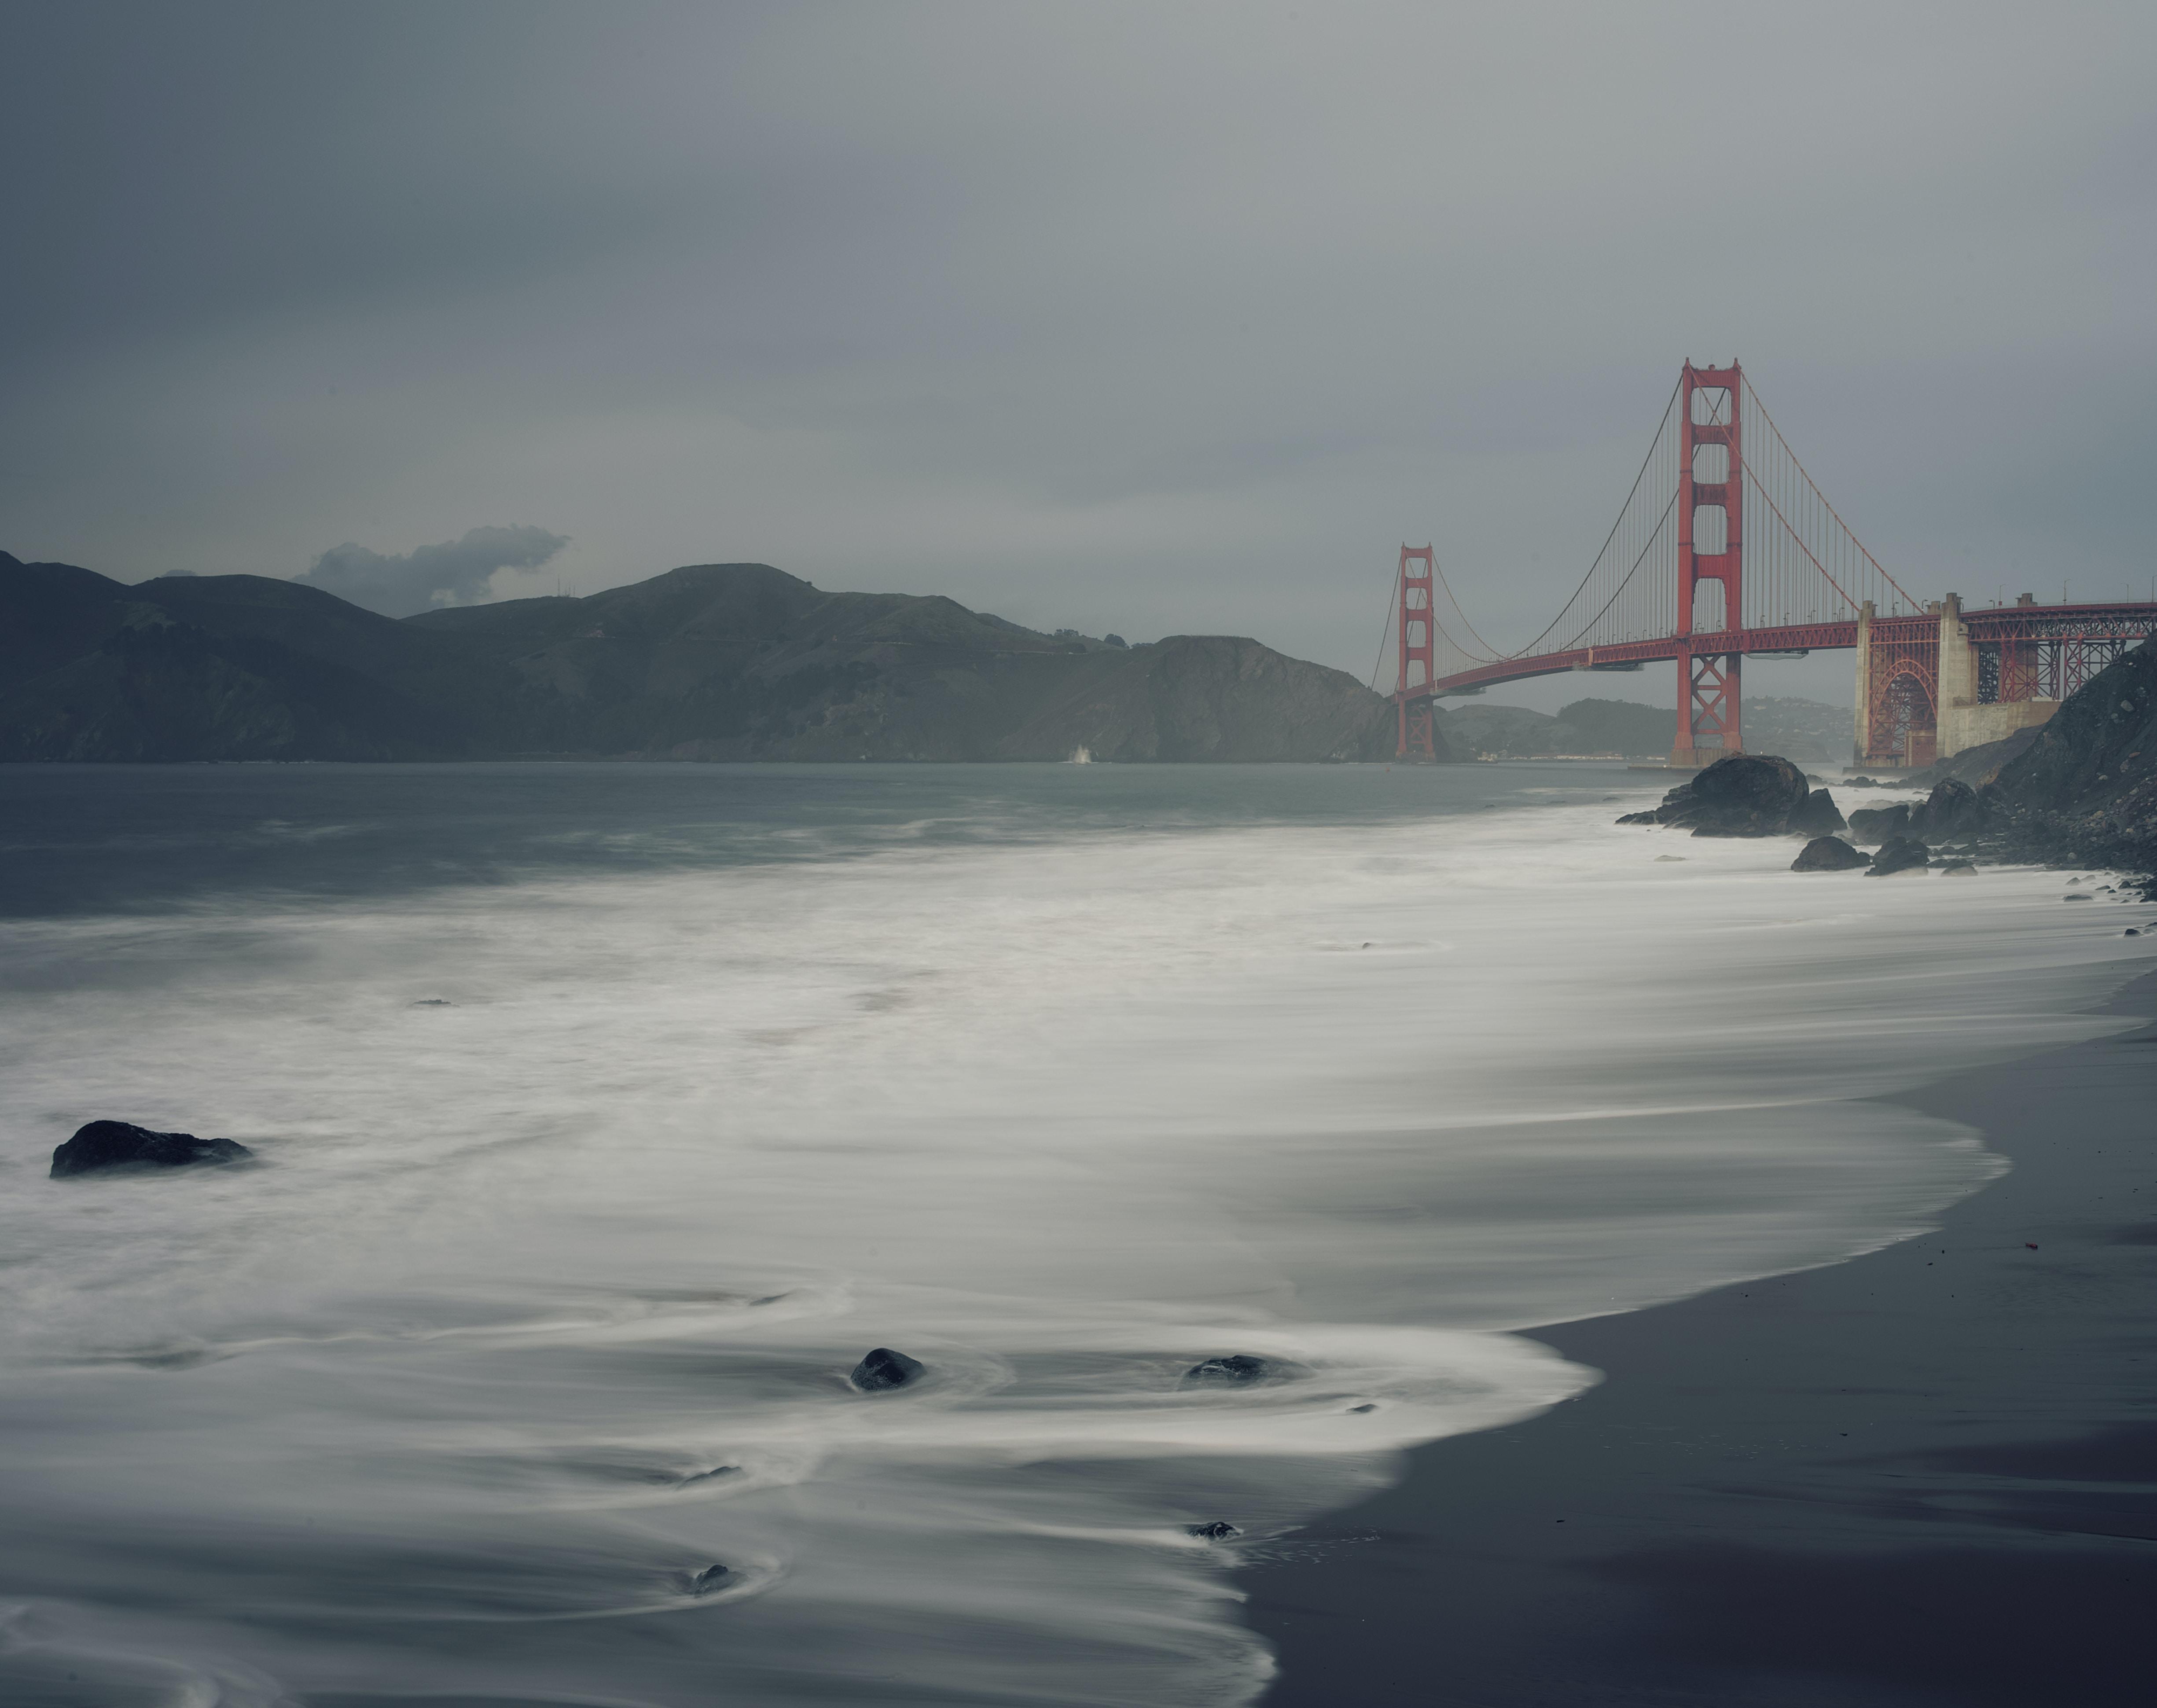 Golden Gate Bridge, San Francisco grayscale photography